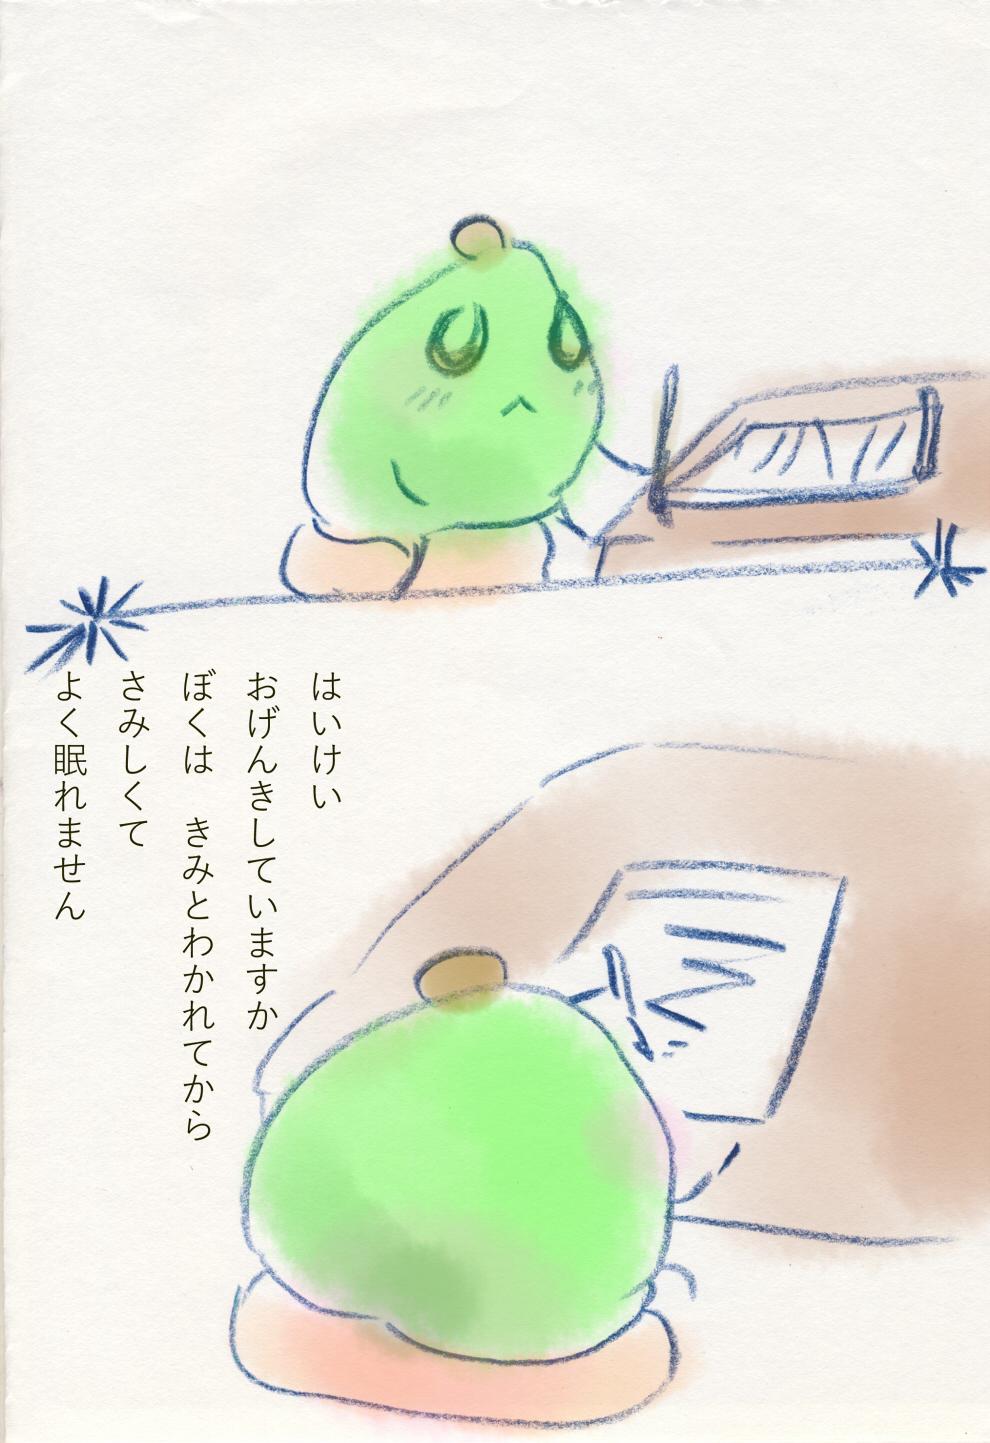 http://ahito.com/comic/short/nega/img//20170810/01.jpg